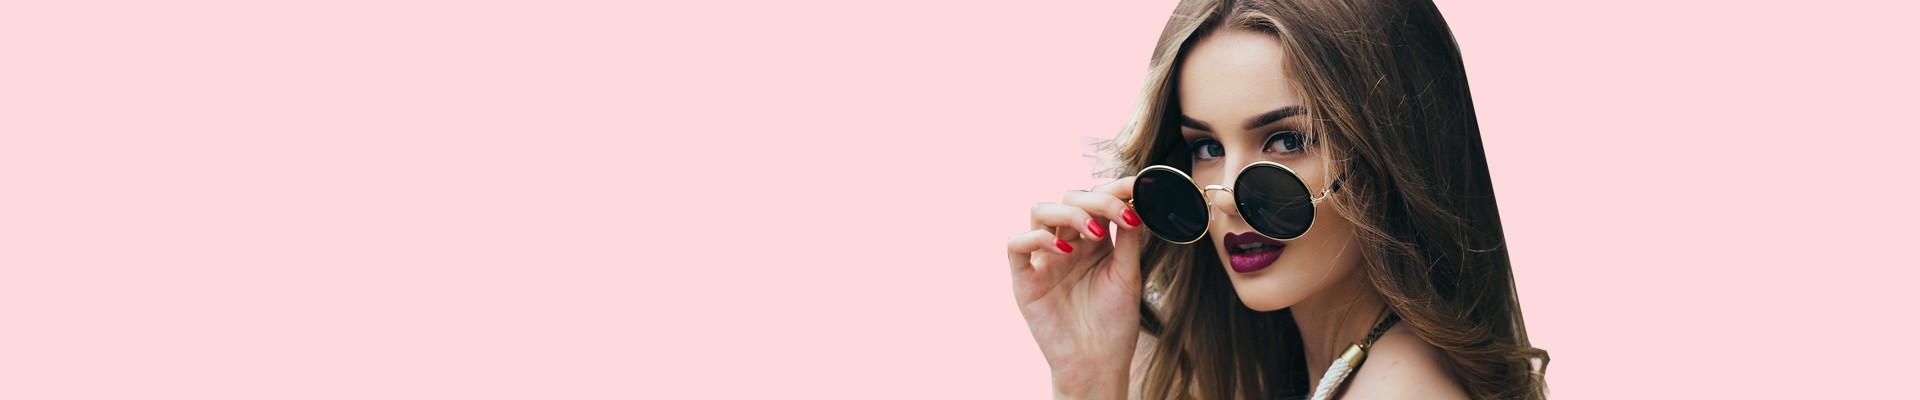 Jual Kacamata Hitam Wanita Wanita Model Terbaru